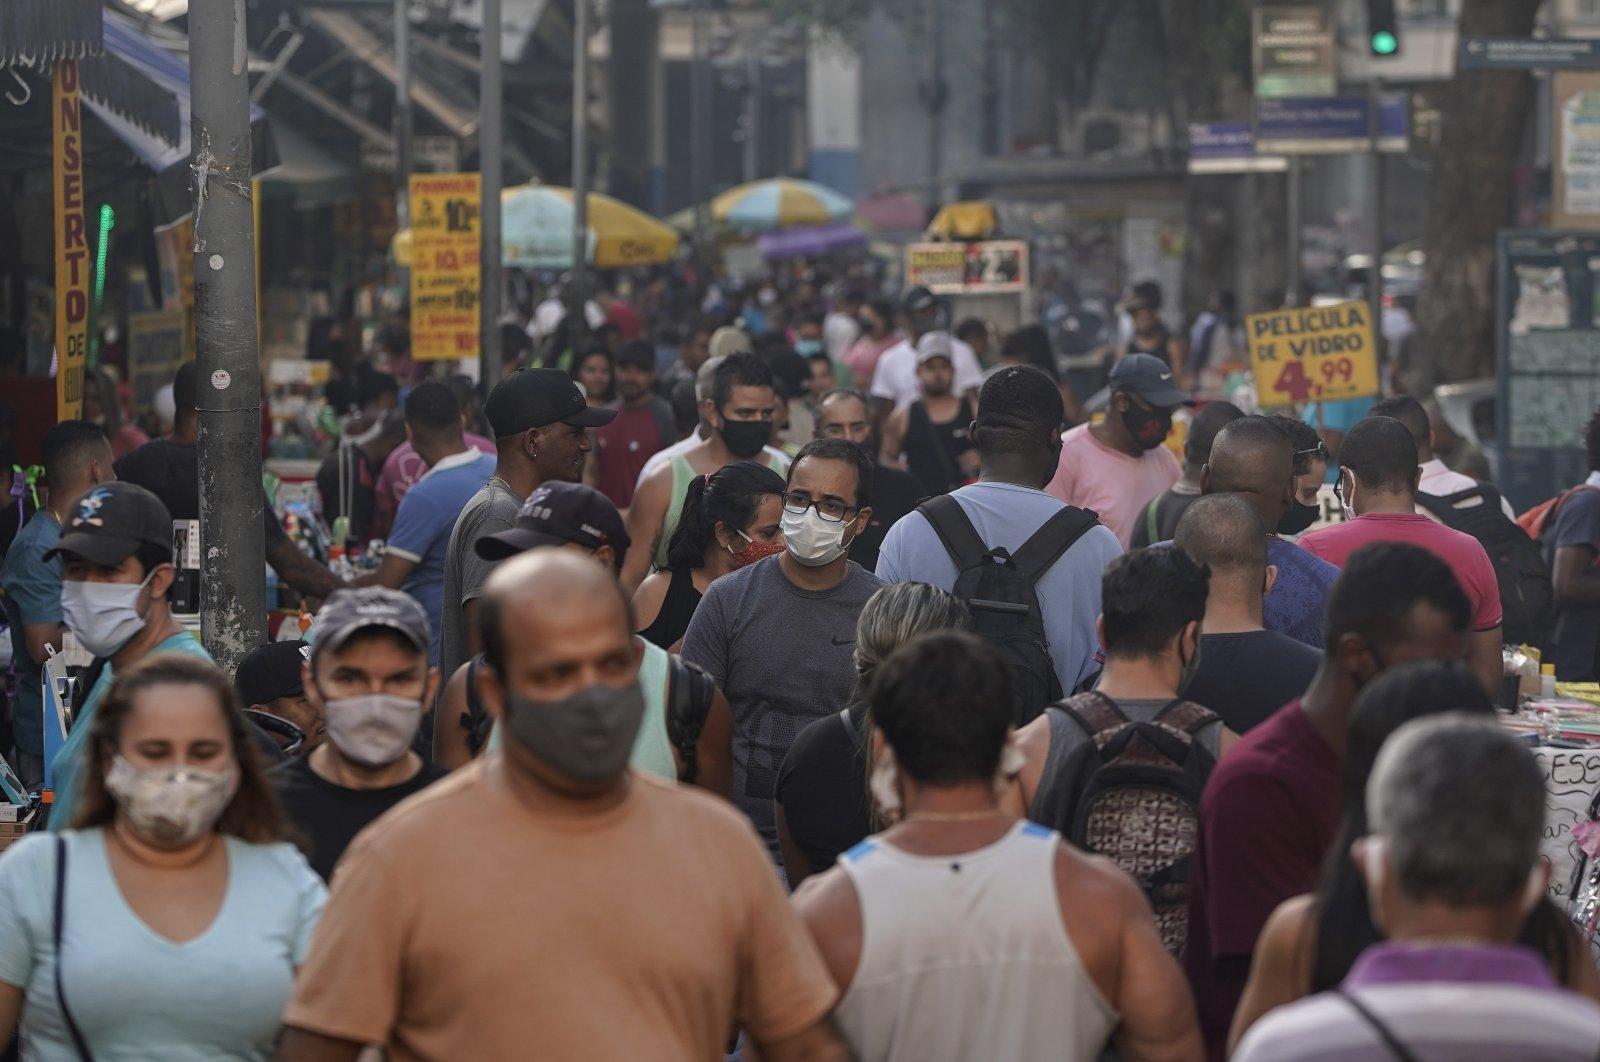 Pedestrians, some wearing protective face masks, walk through a street market in downtown, Rio de Janeiro, Brazil, June 25, 2020. (AP Photo)